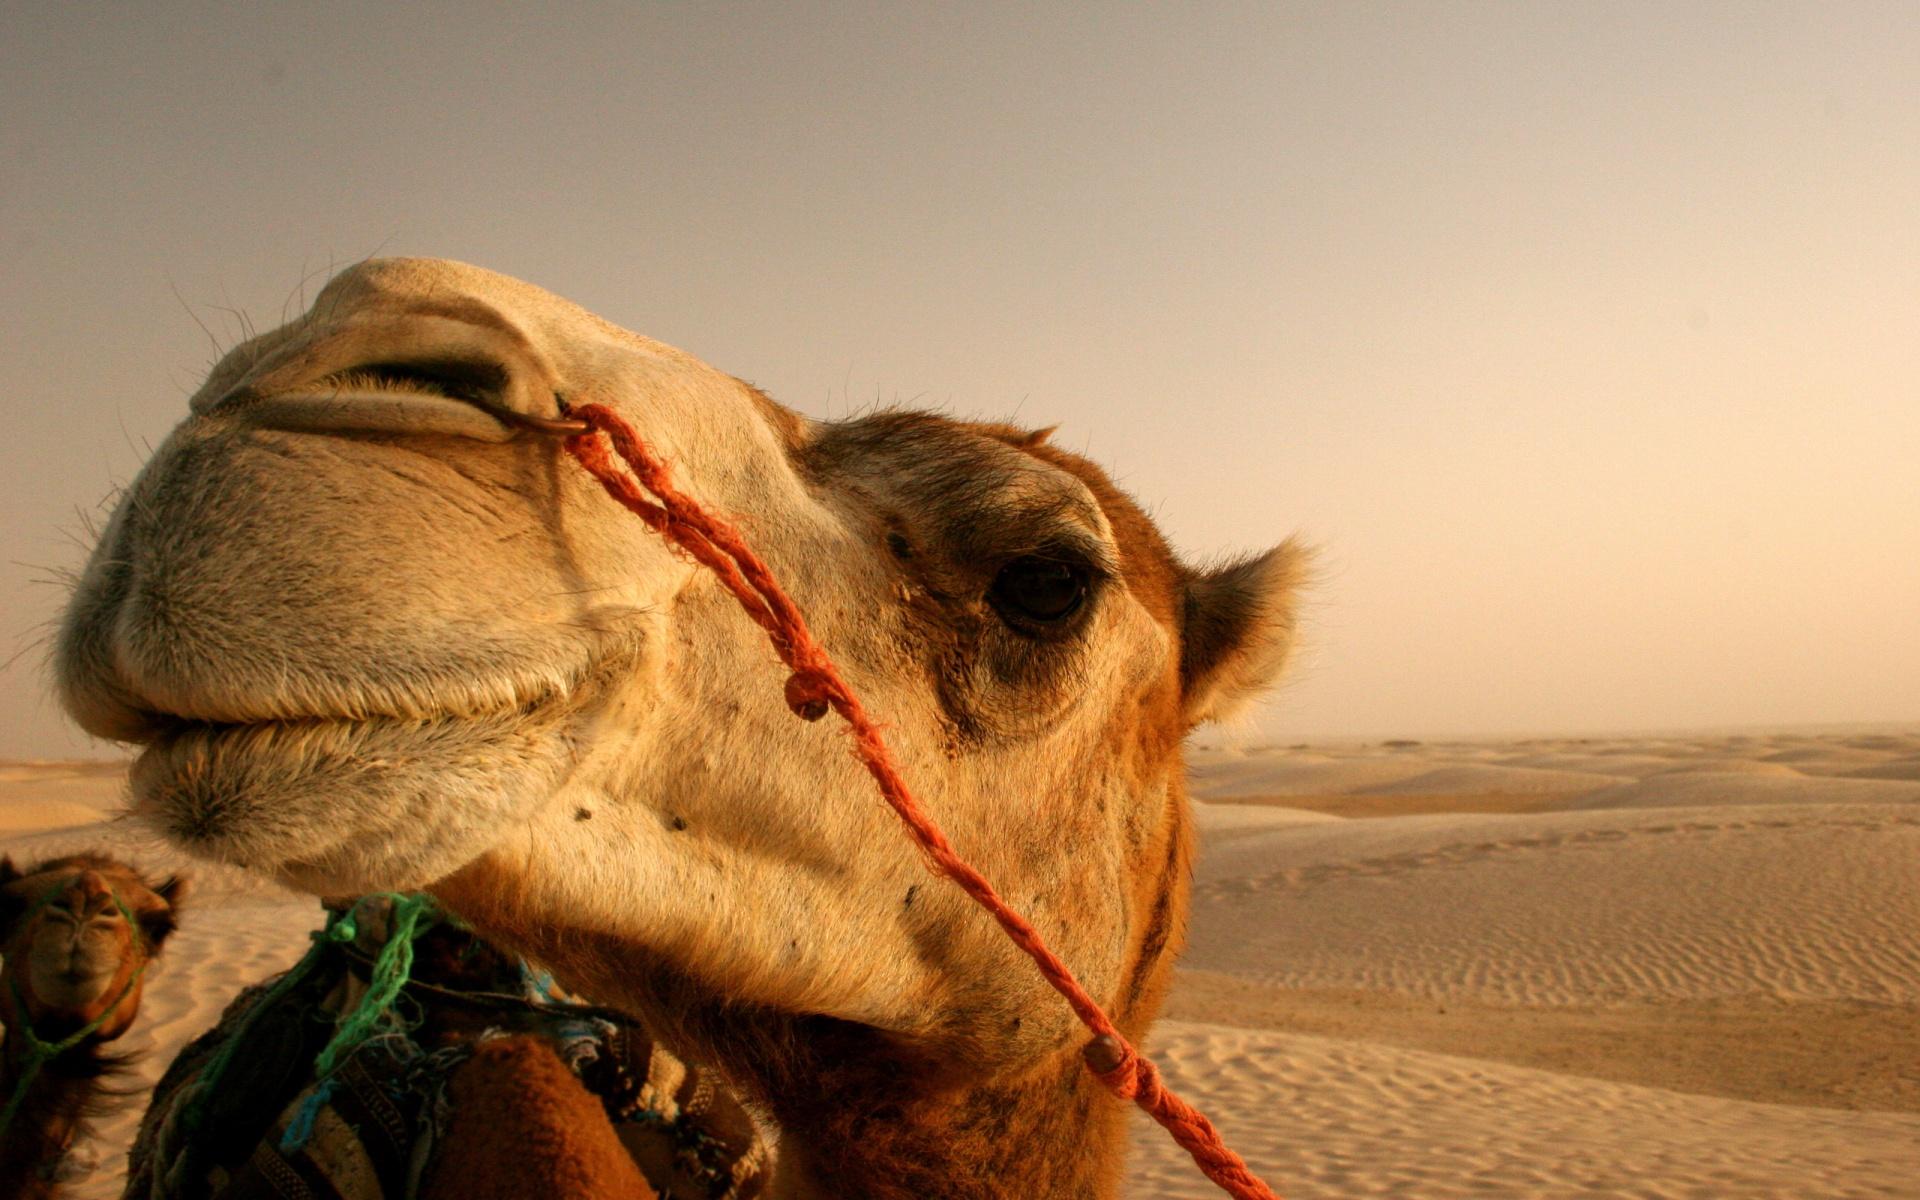 Camel Wallpaper